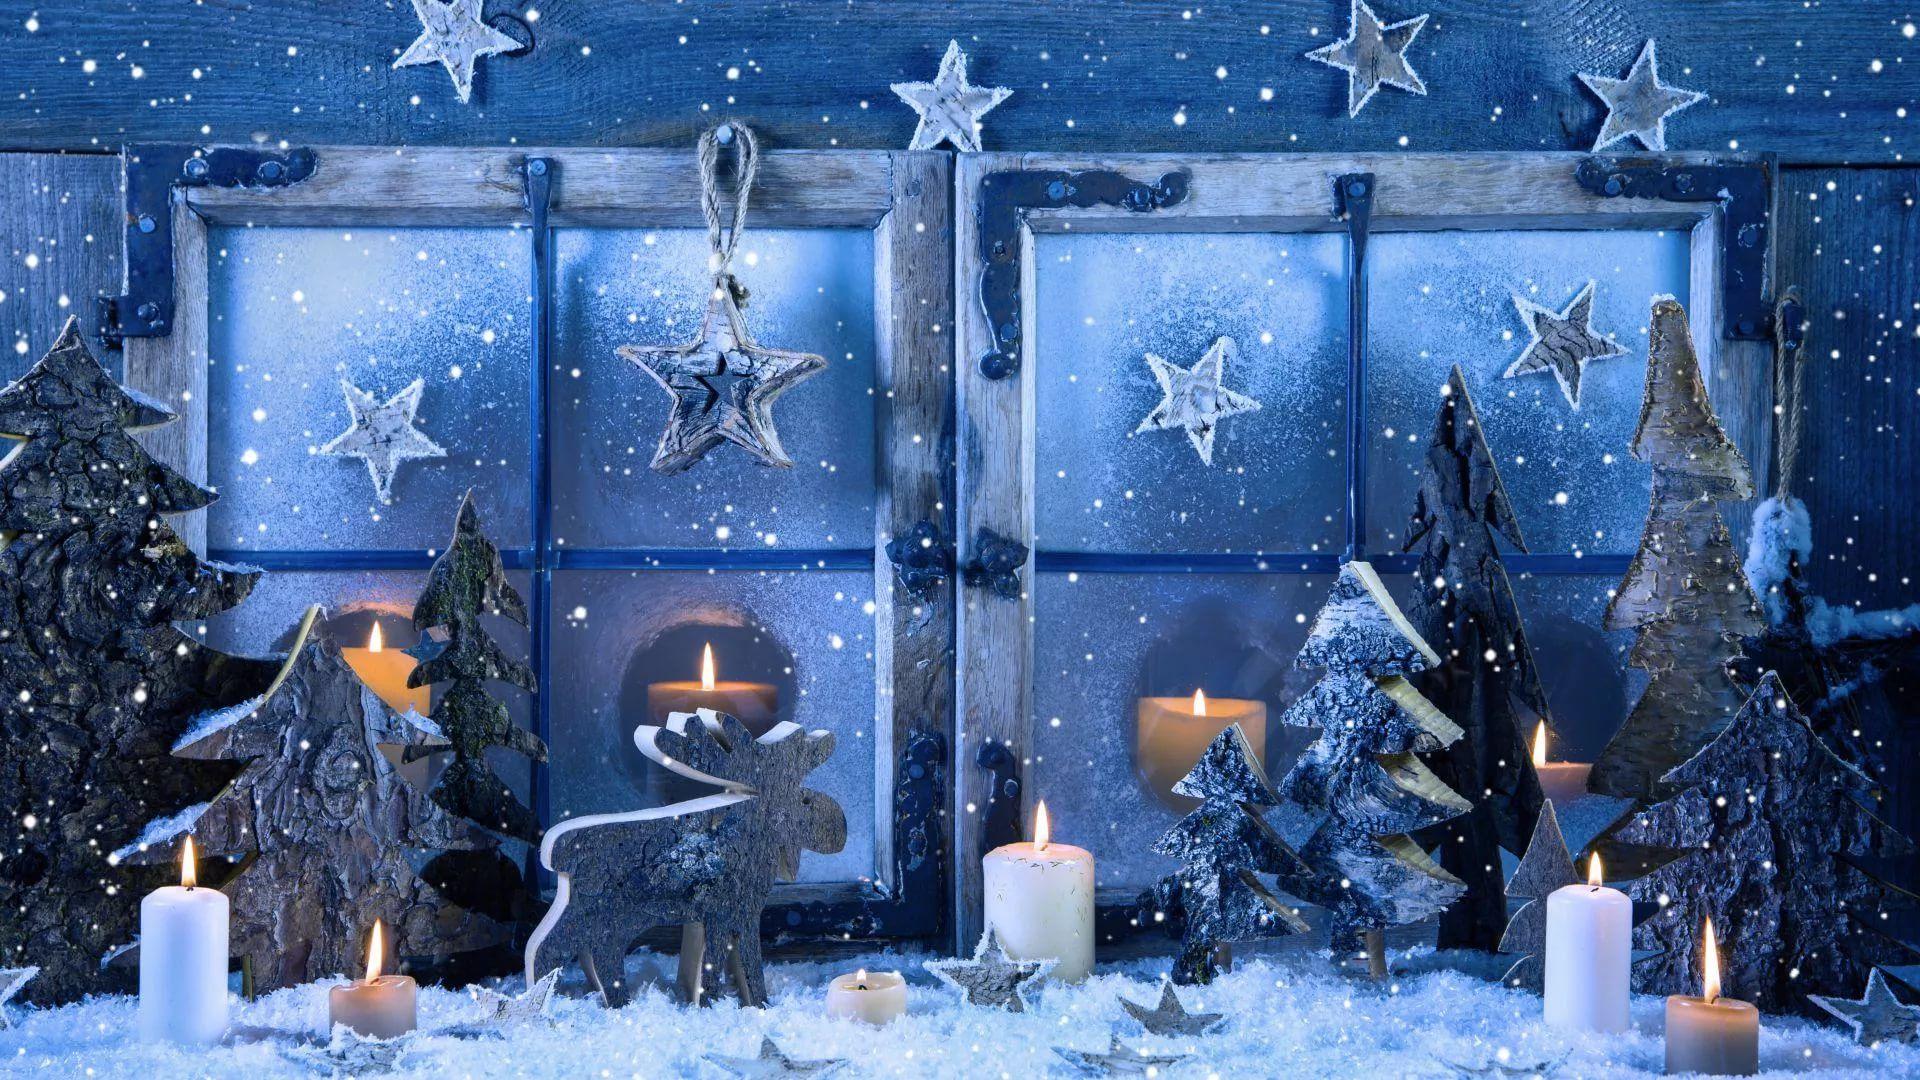 Happy Winter wallpaper theme